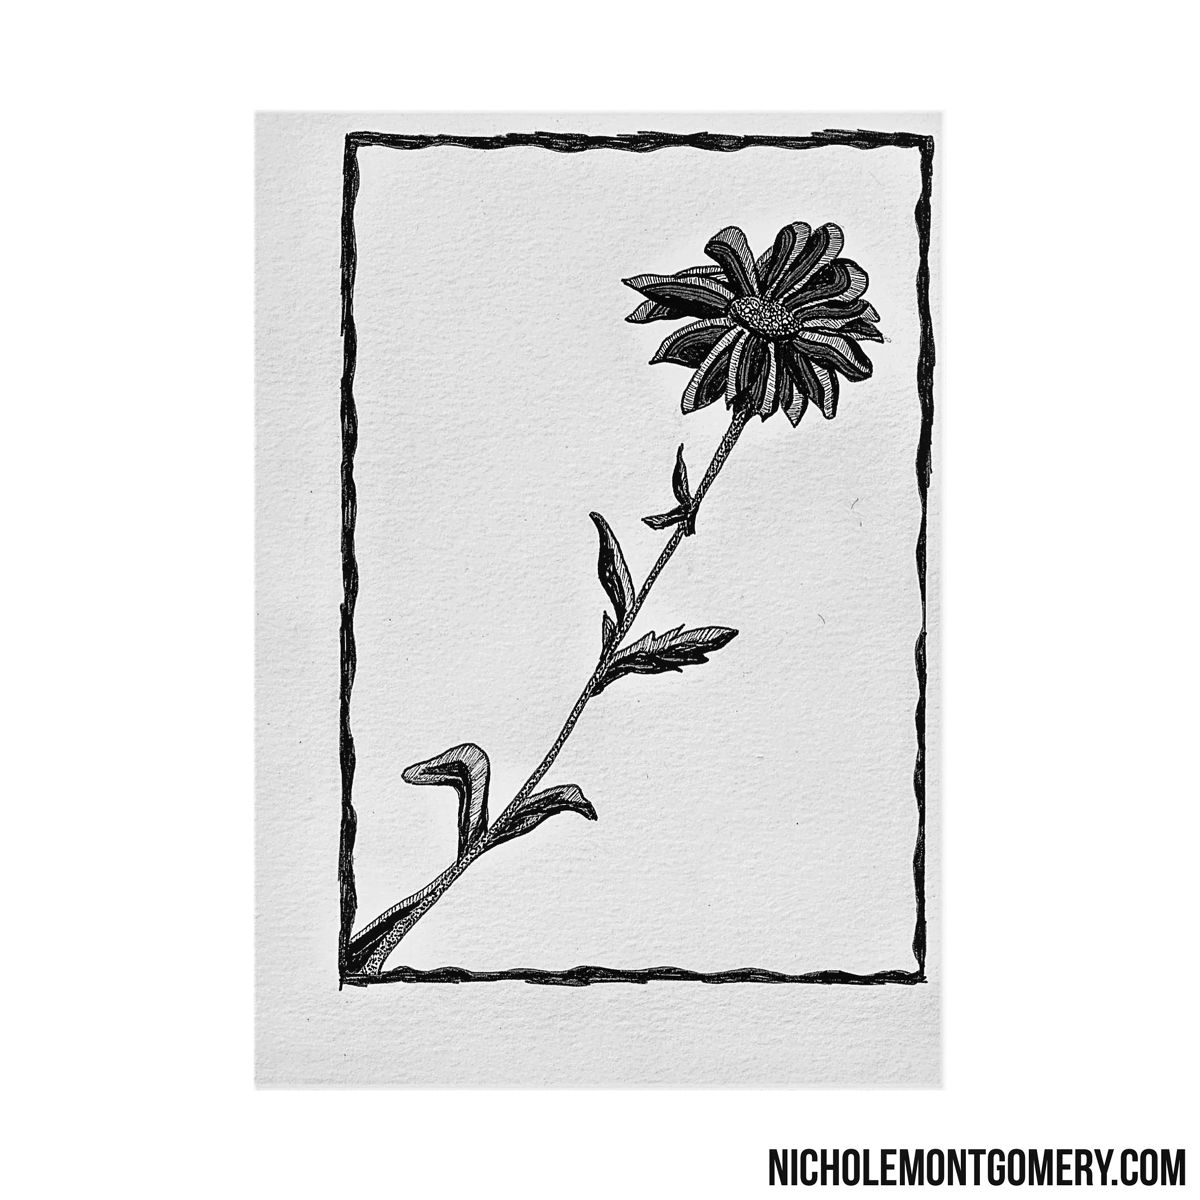 Purchase options: NicholeMontgomery.com • Artist: Nichole Montgomery Tulsa, OK  • #tulsaartist #Oklahomaartist #NicholeMontgomery #artist #art #drawing #artwork #doodle #illustration #ink #universe #penandink #inkdrawing #inked #drawings #garden #flowers #floral #design #draw #flower #oddities #lines #lineart #nature  #bw #bloom #zentangle #floral